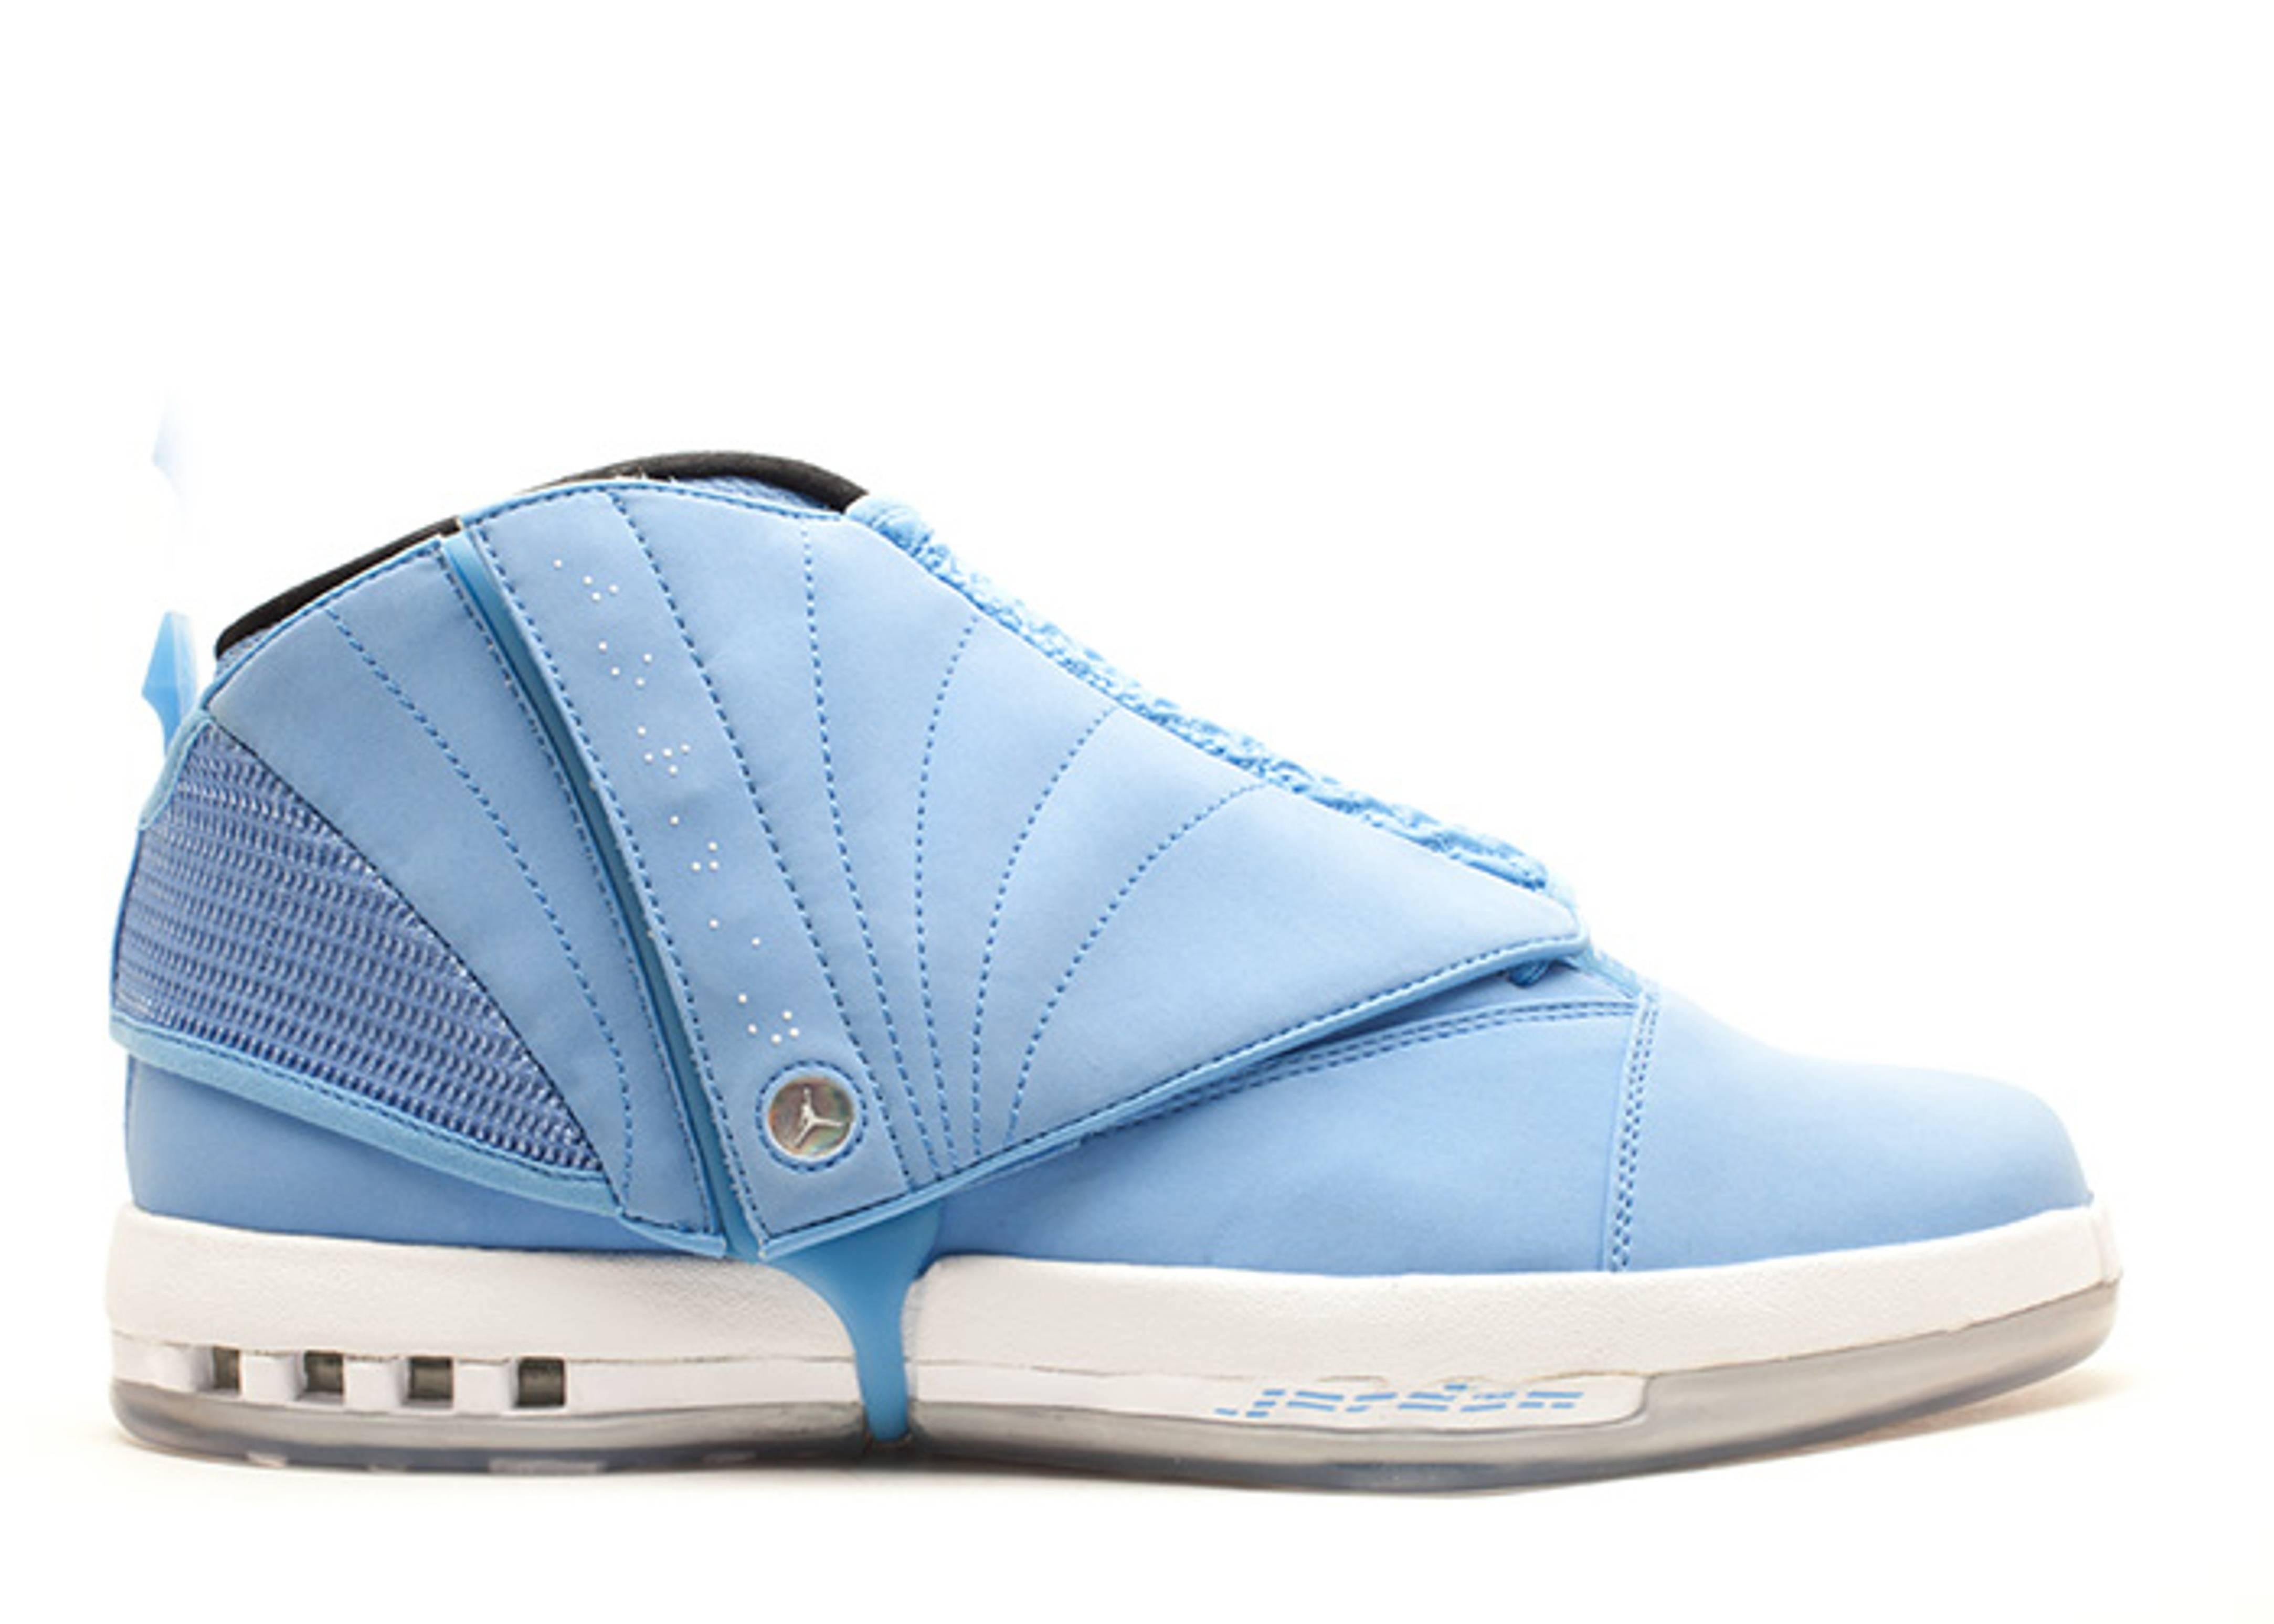 size 40 b67a2 8f6d9 Air Jordan 16